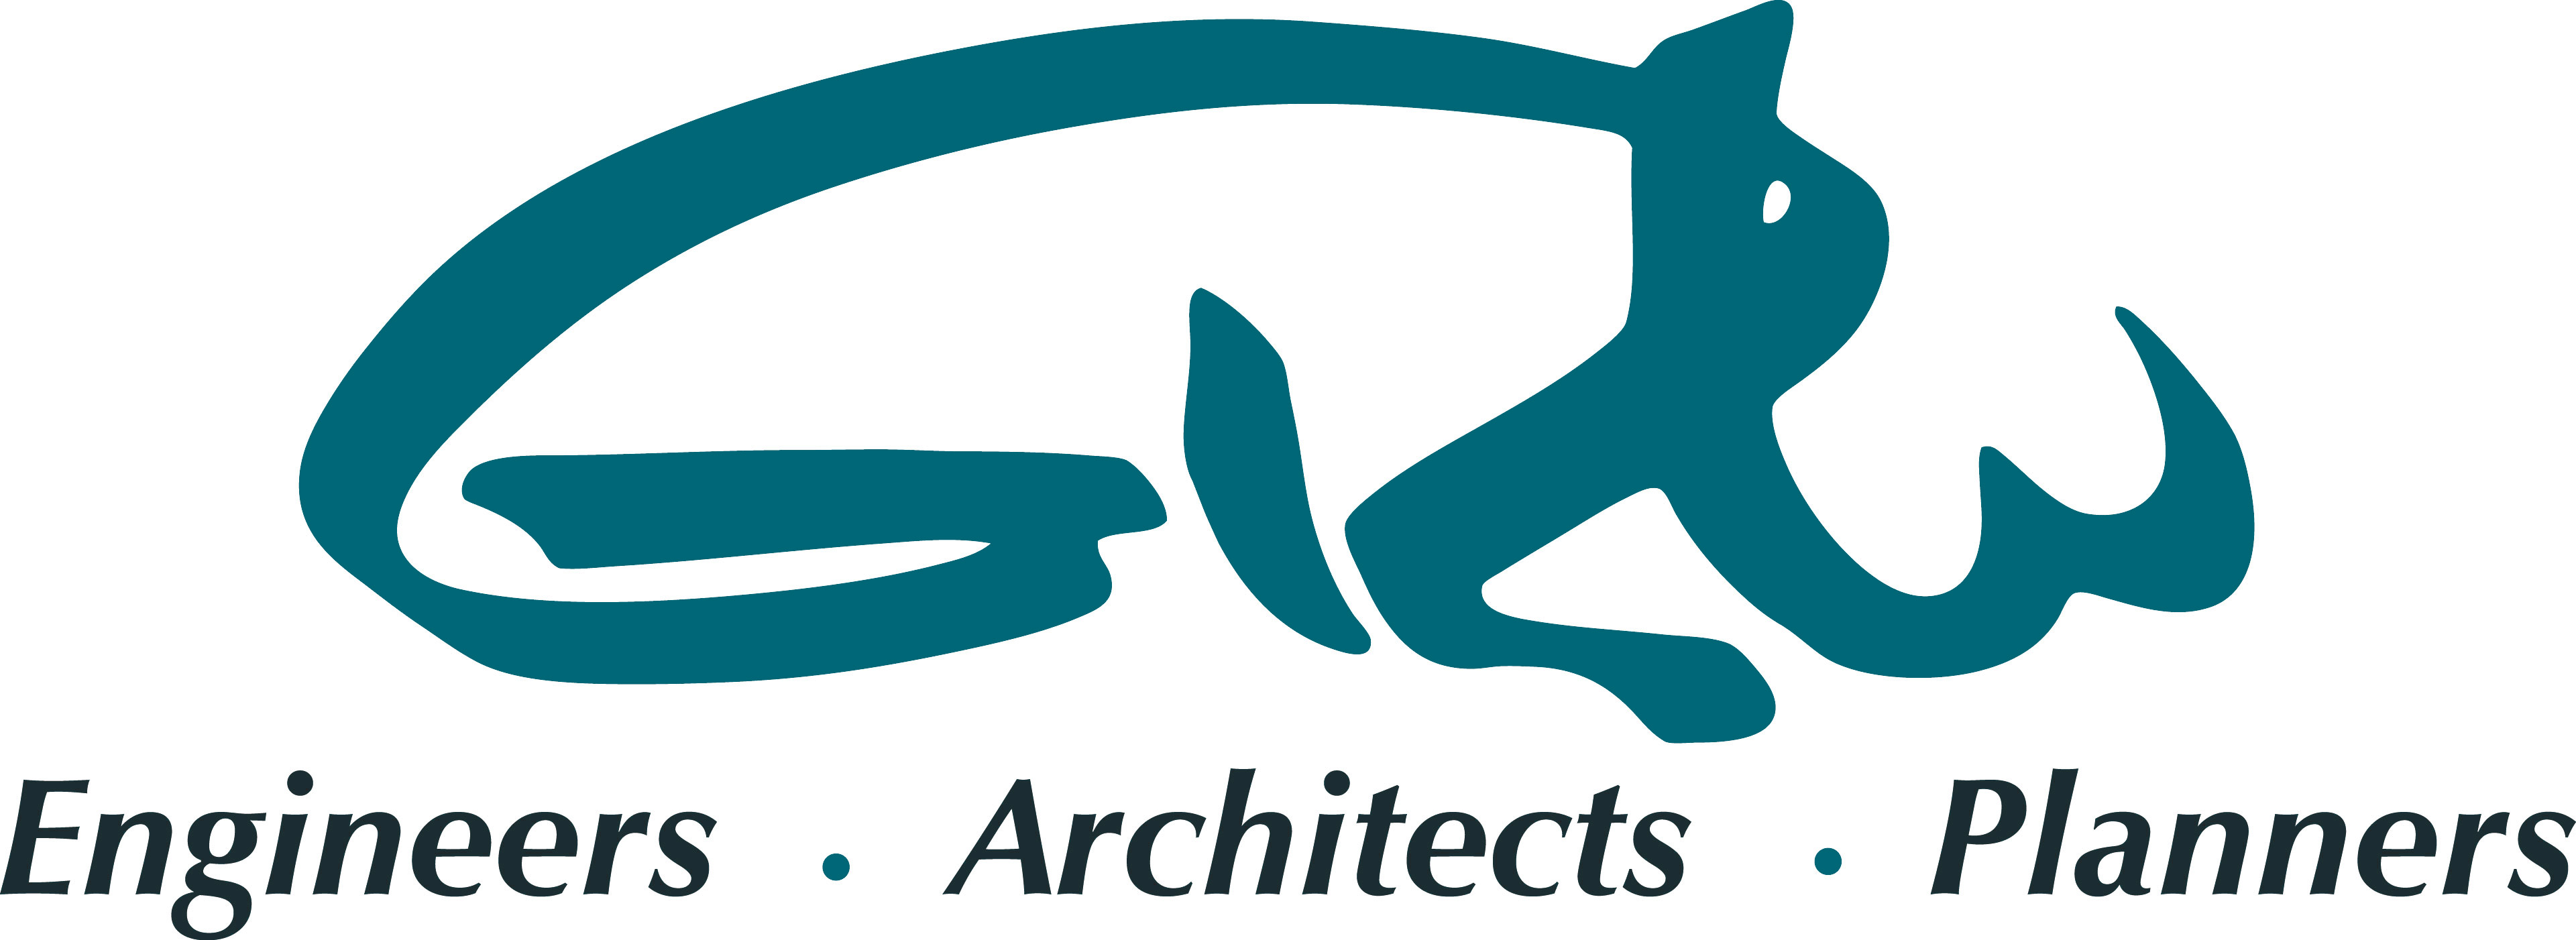 GRW logo